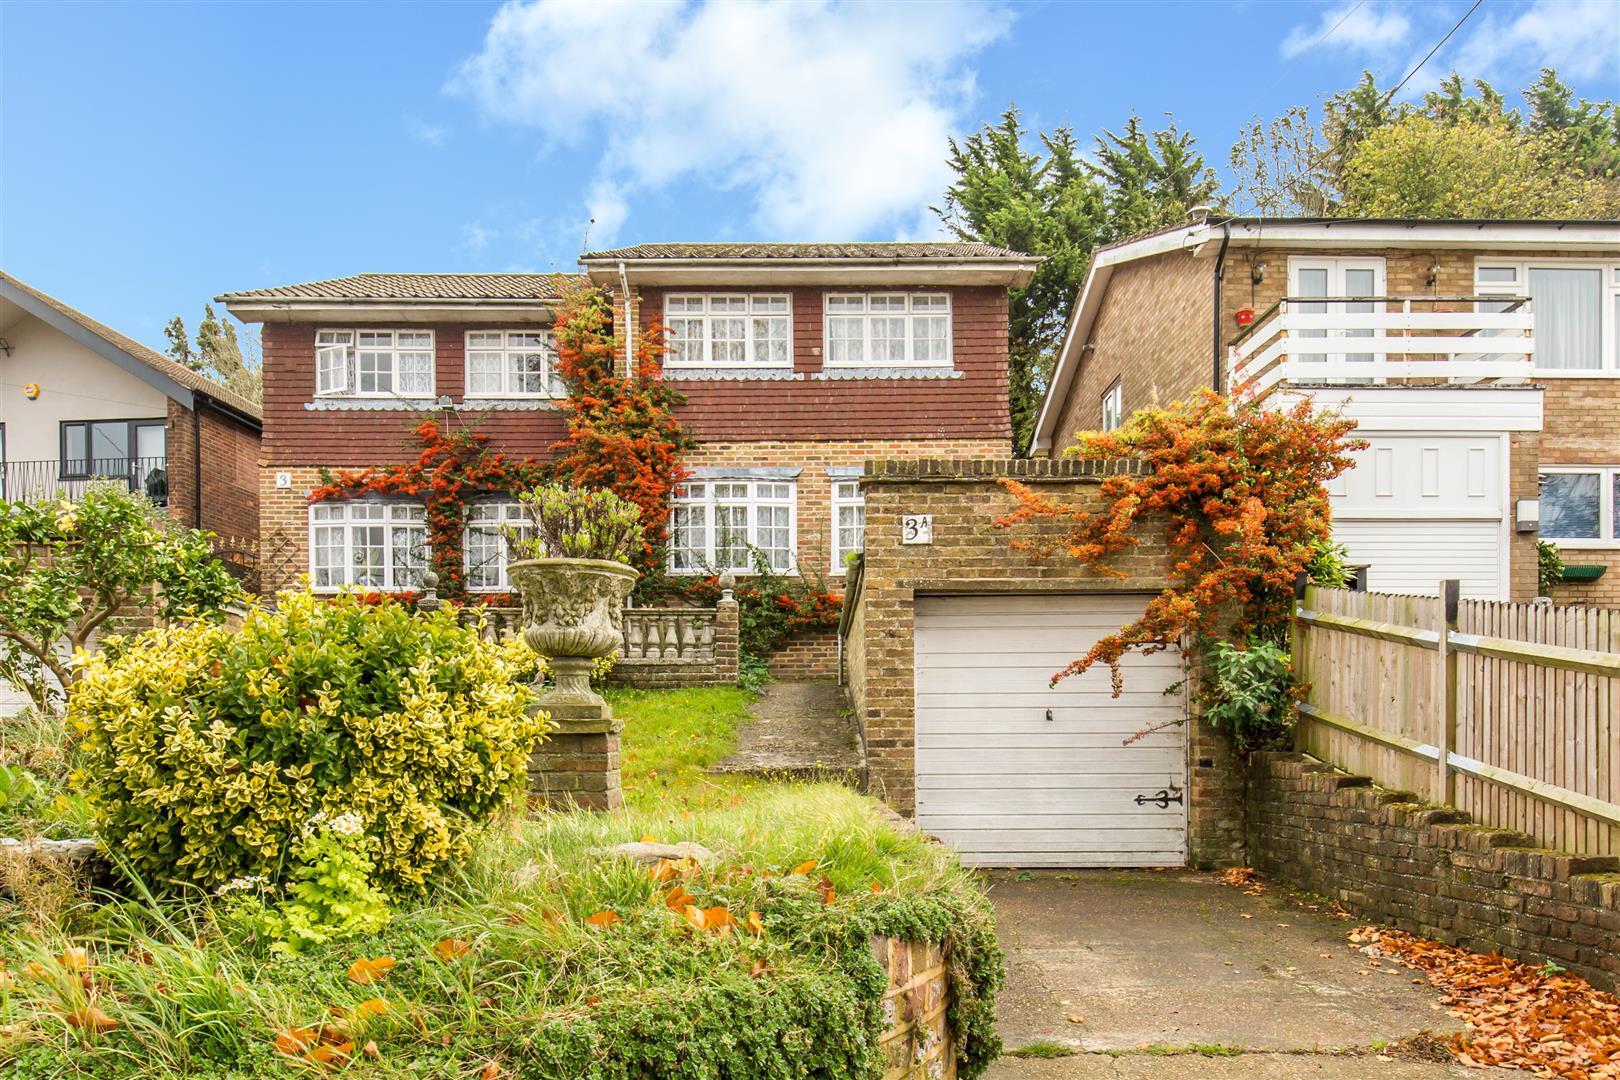 3 Bedrooms Semi Detached House for sale in Hillcrest Road, Biggin Hill, Westerham